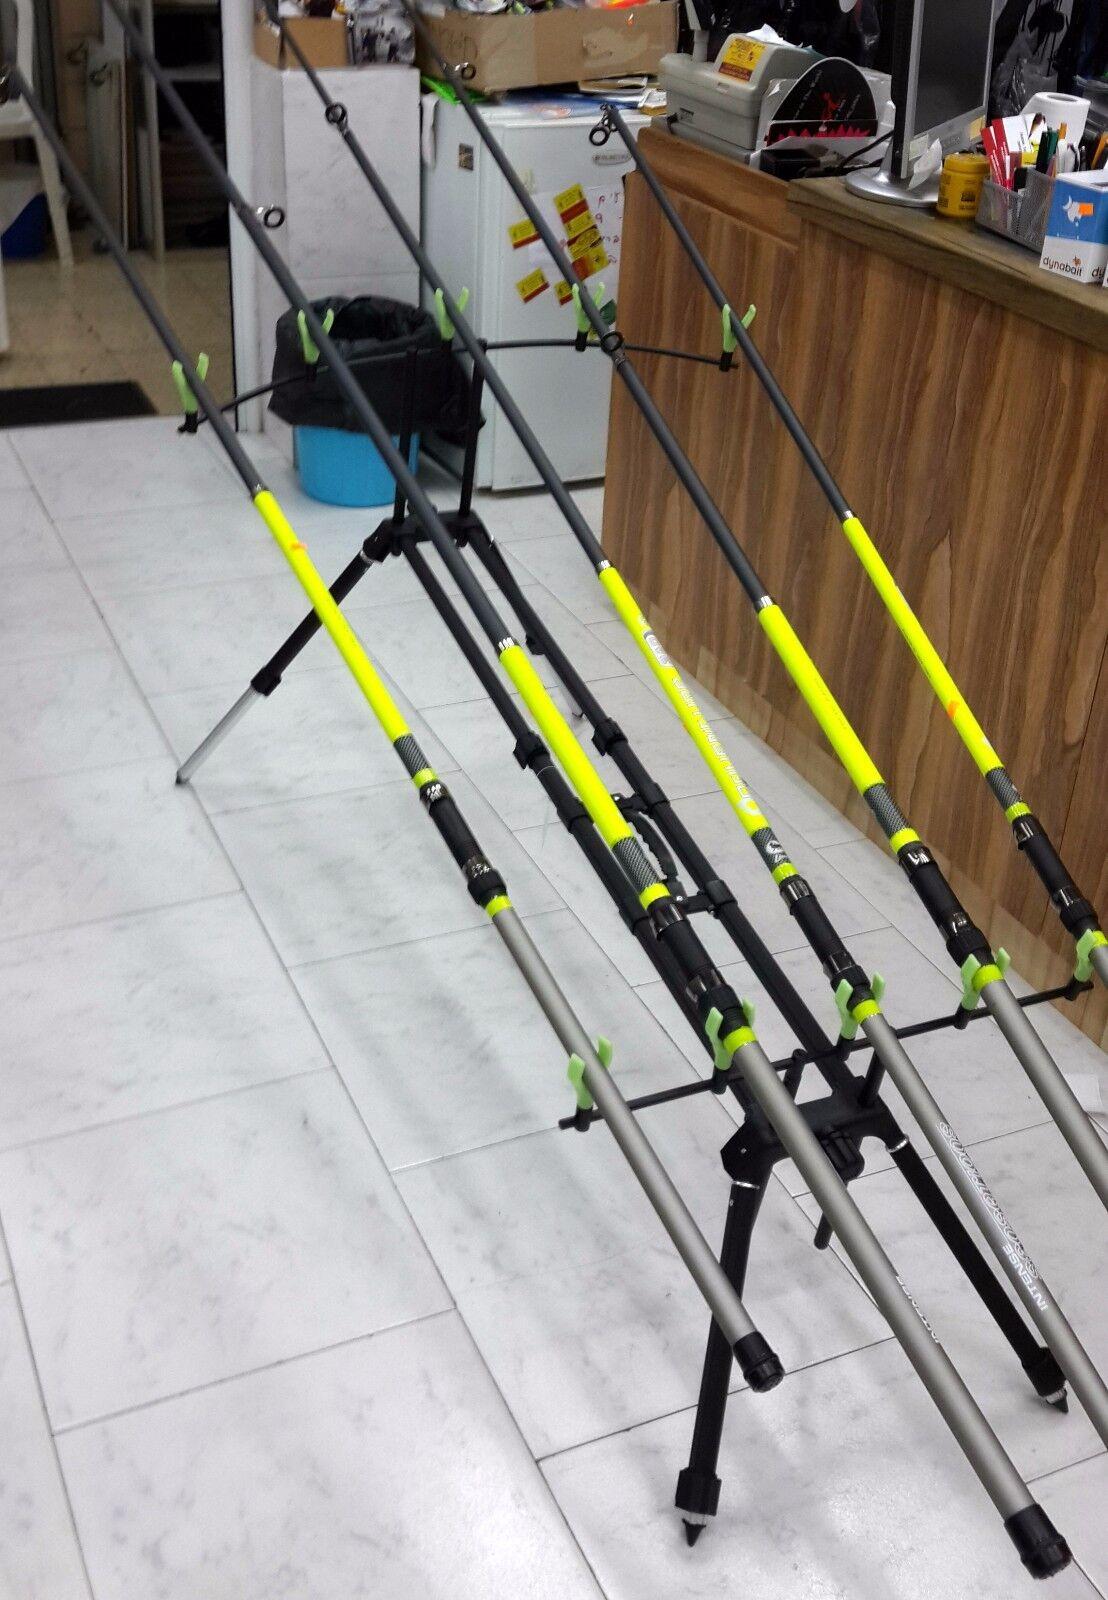 Fishing Rod Pod Carp 5 Aluminum U+V Holders + Case-Stand for 5 Carp Rods S.I.L 9be576